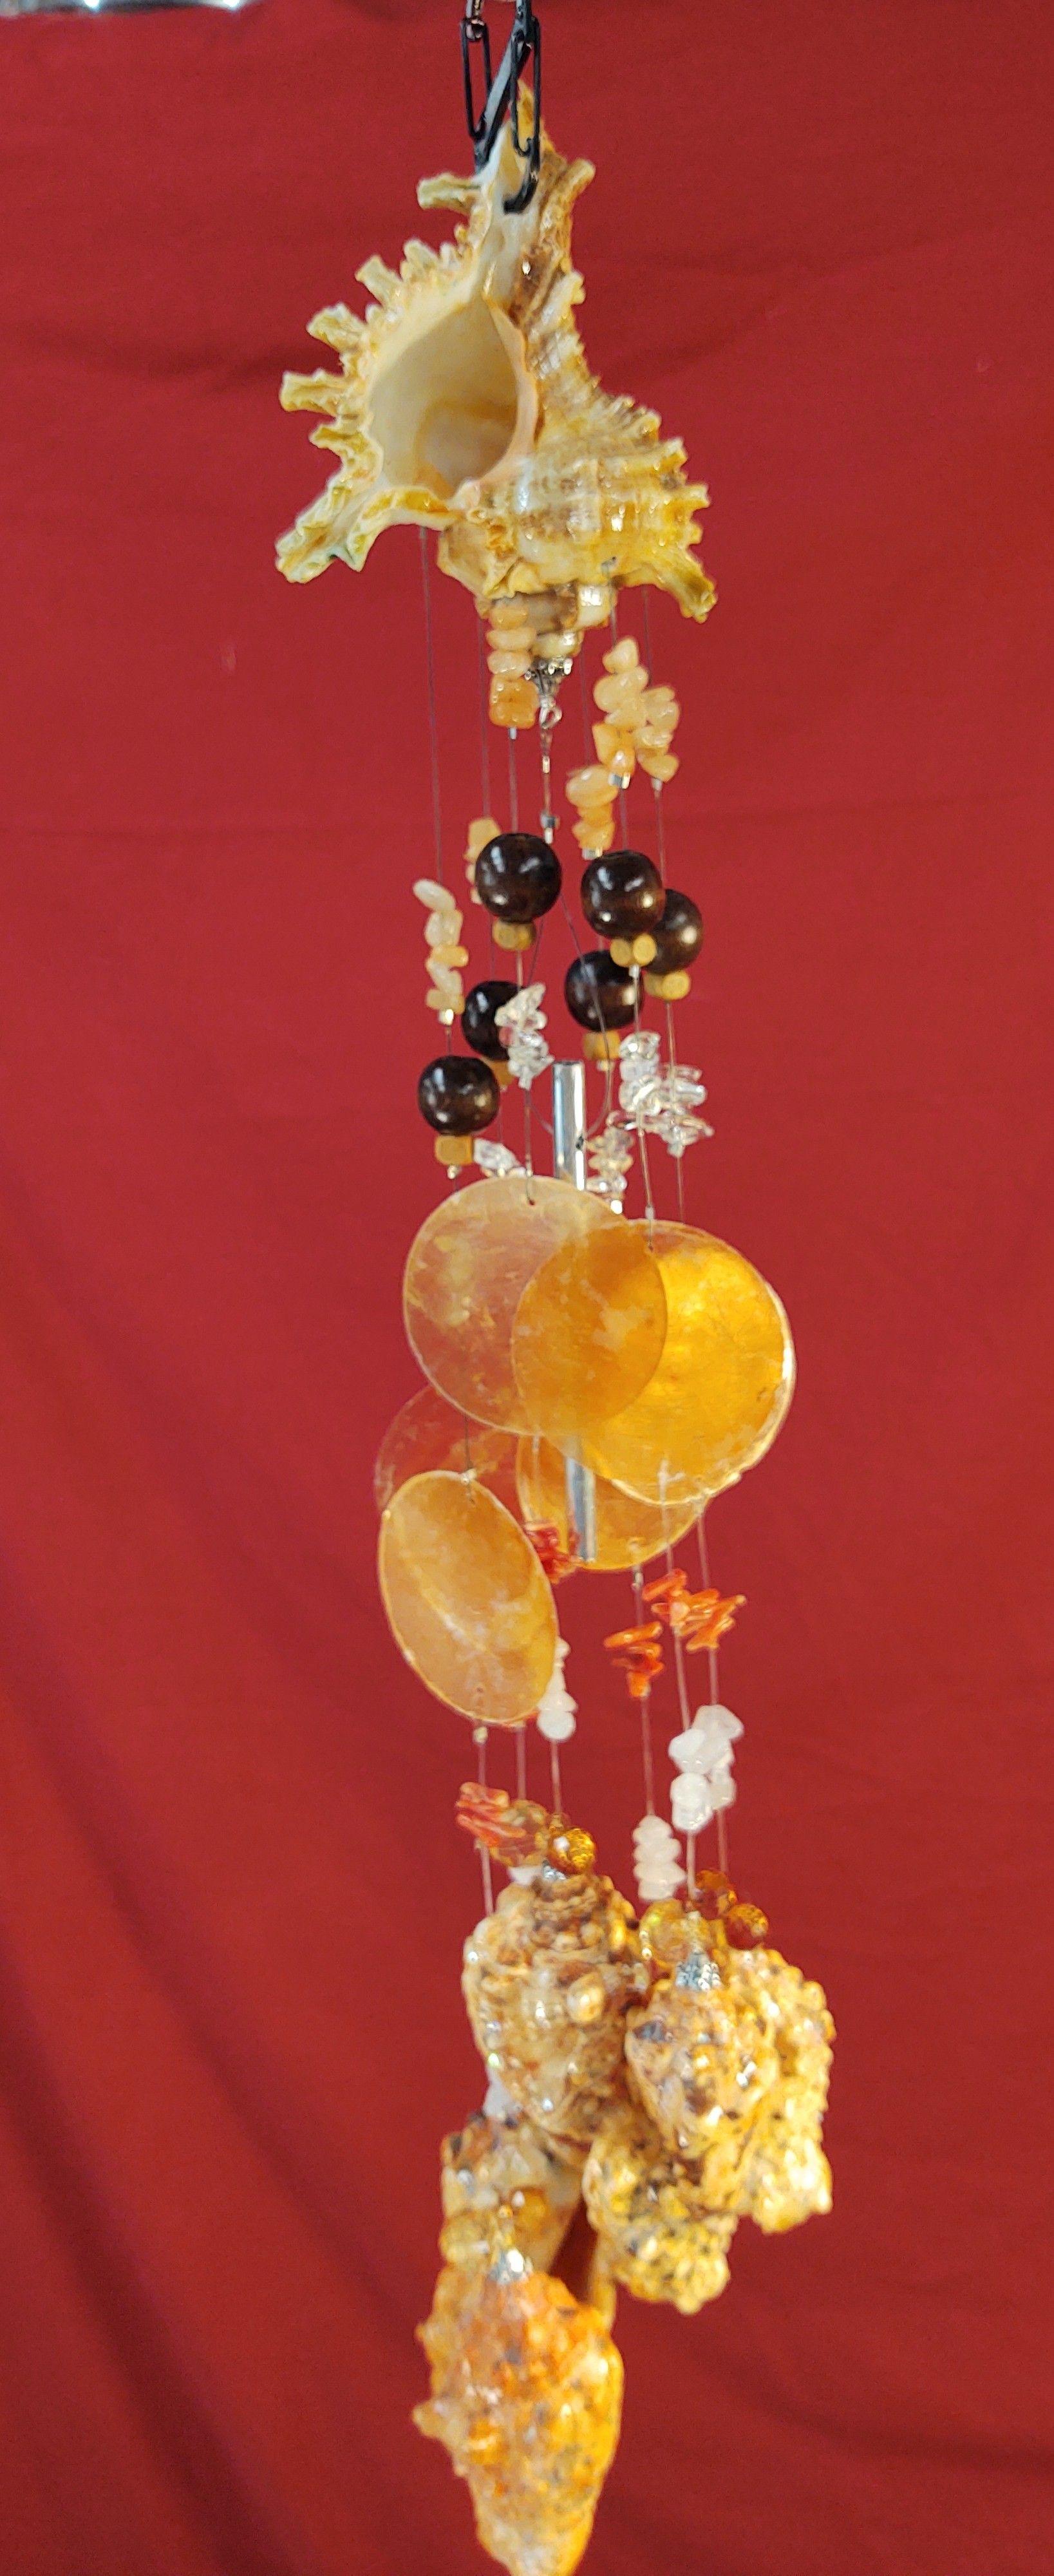 #137  3x21 150z  Orange Spinny Conh with